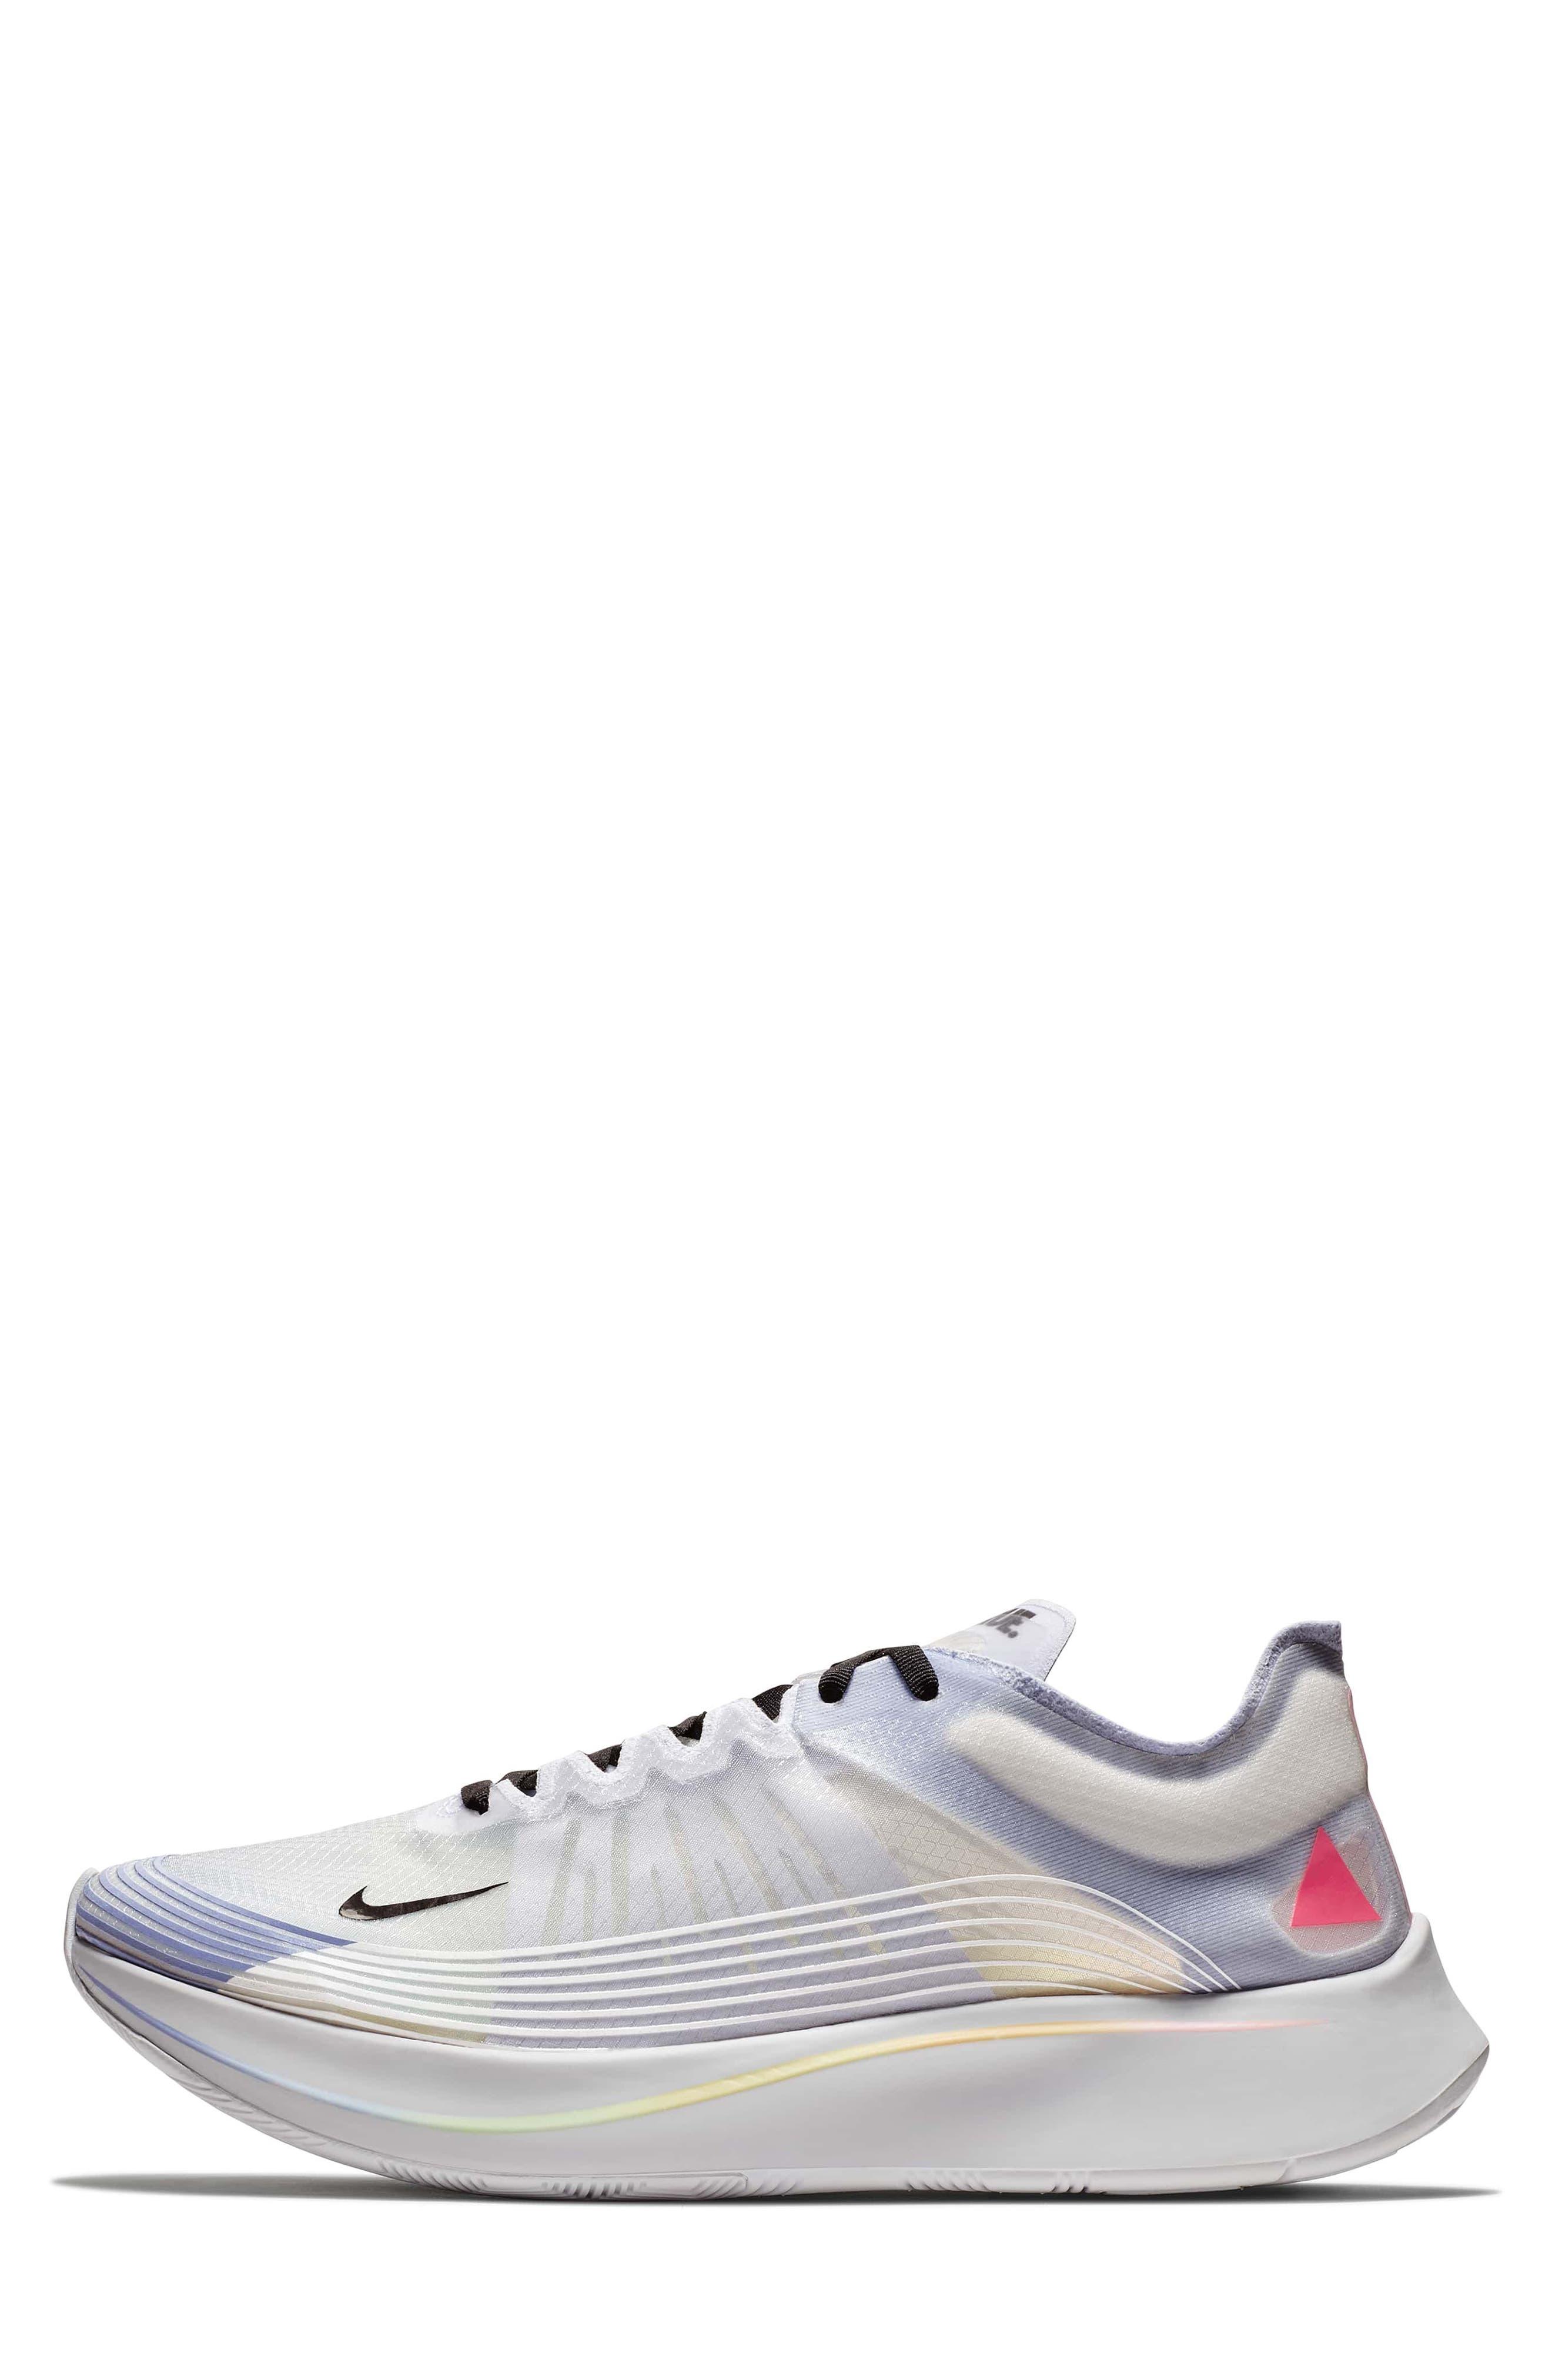 Nordstrom x Nike Zoom Fly BETRUE Running Shoe,                             Alternate thumbnail 3, color,                             White/ Black/ Palest Purple